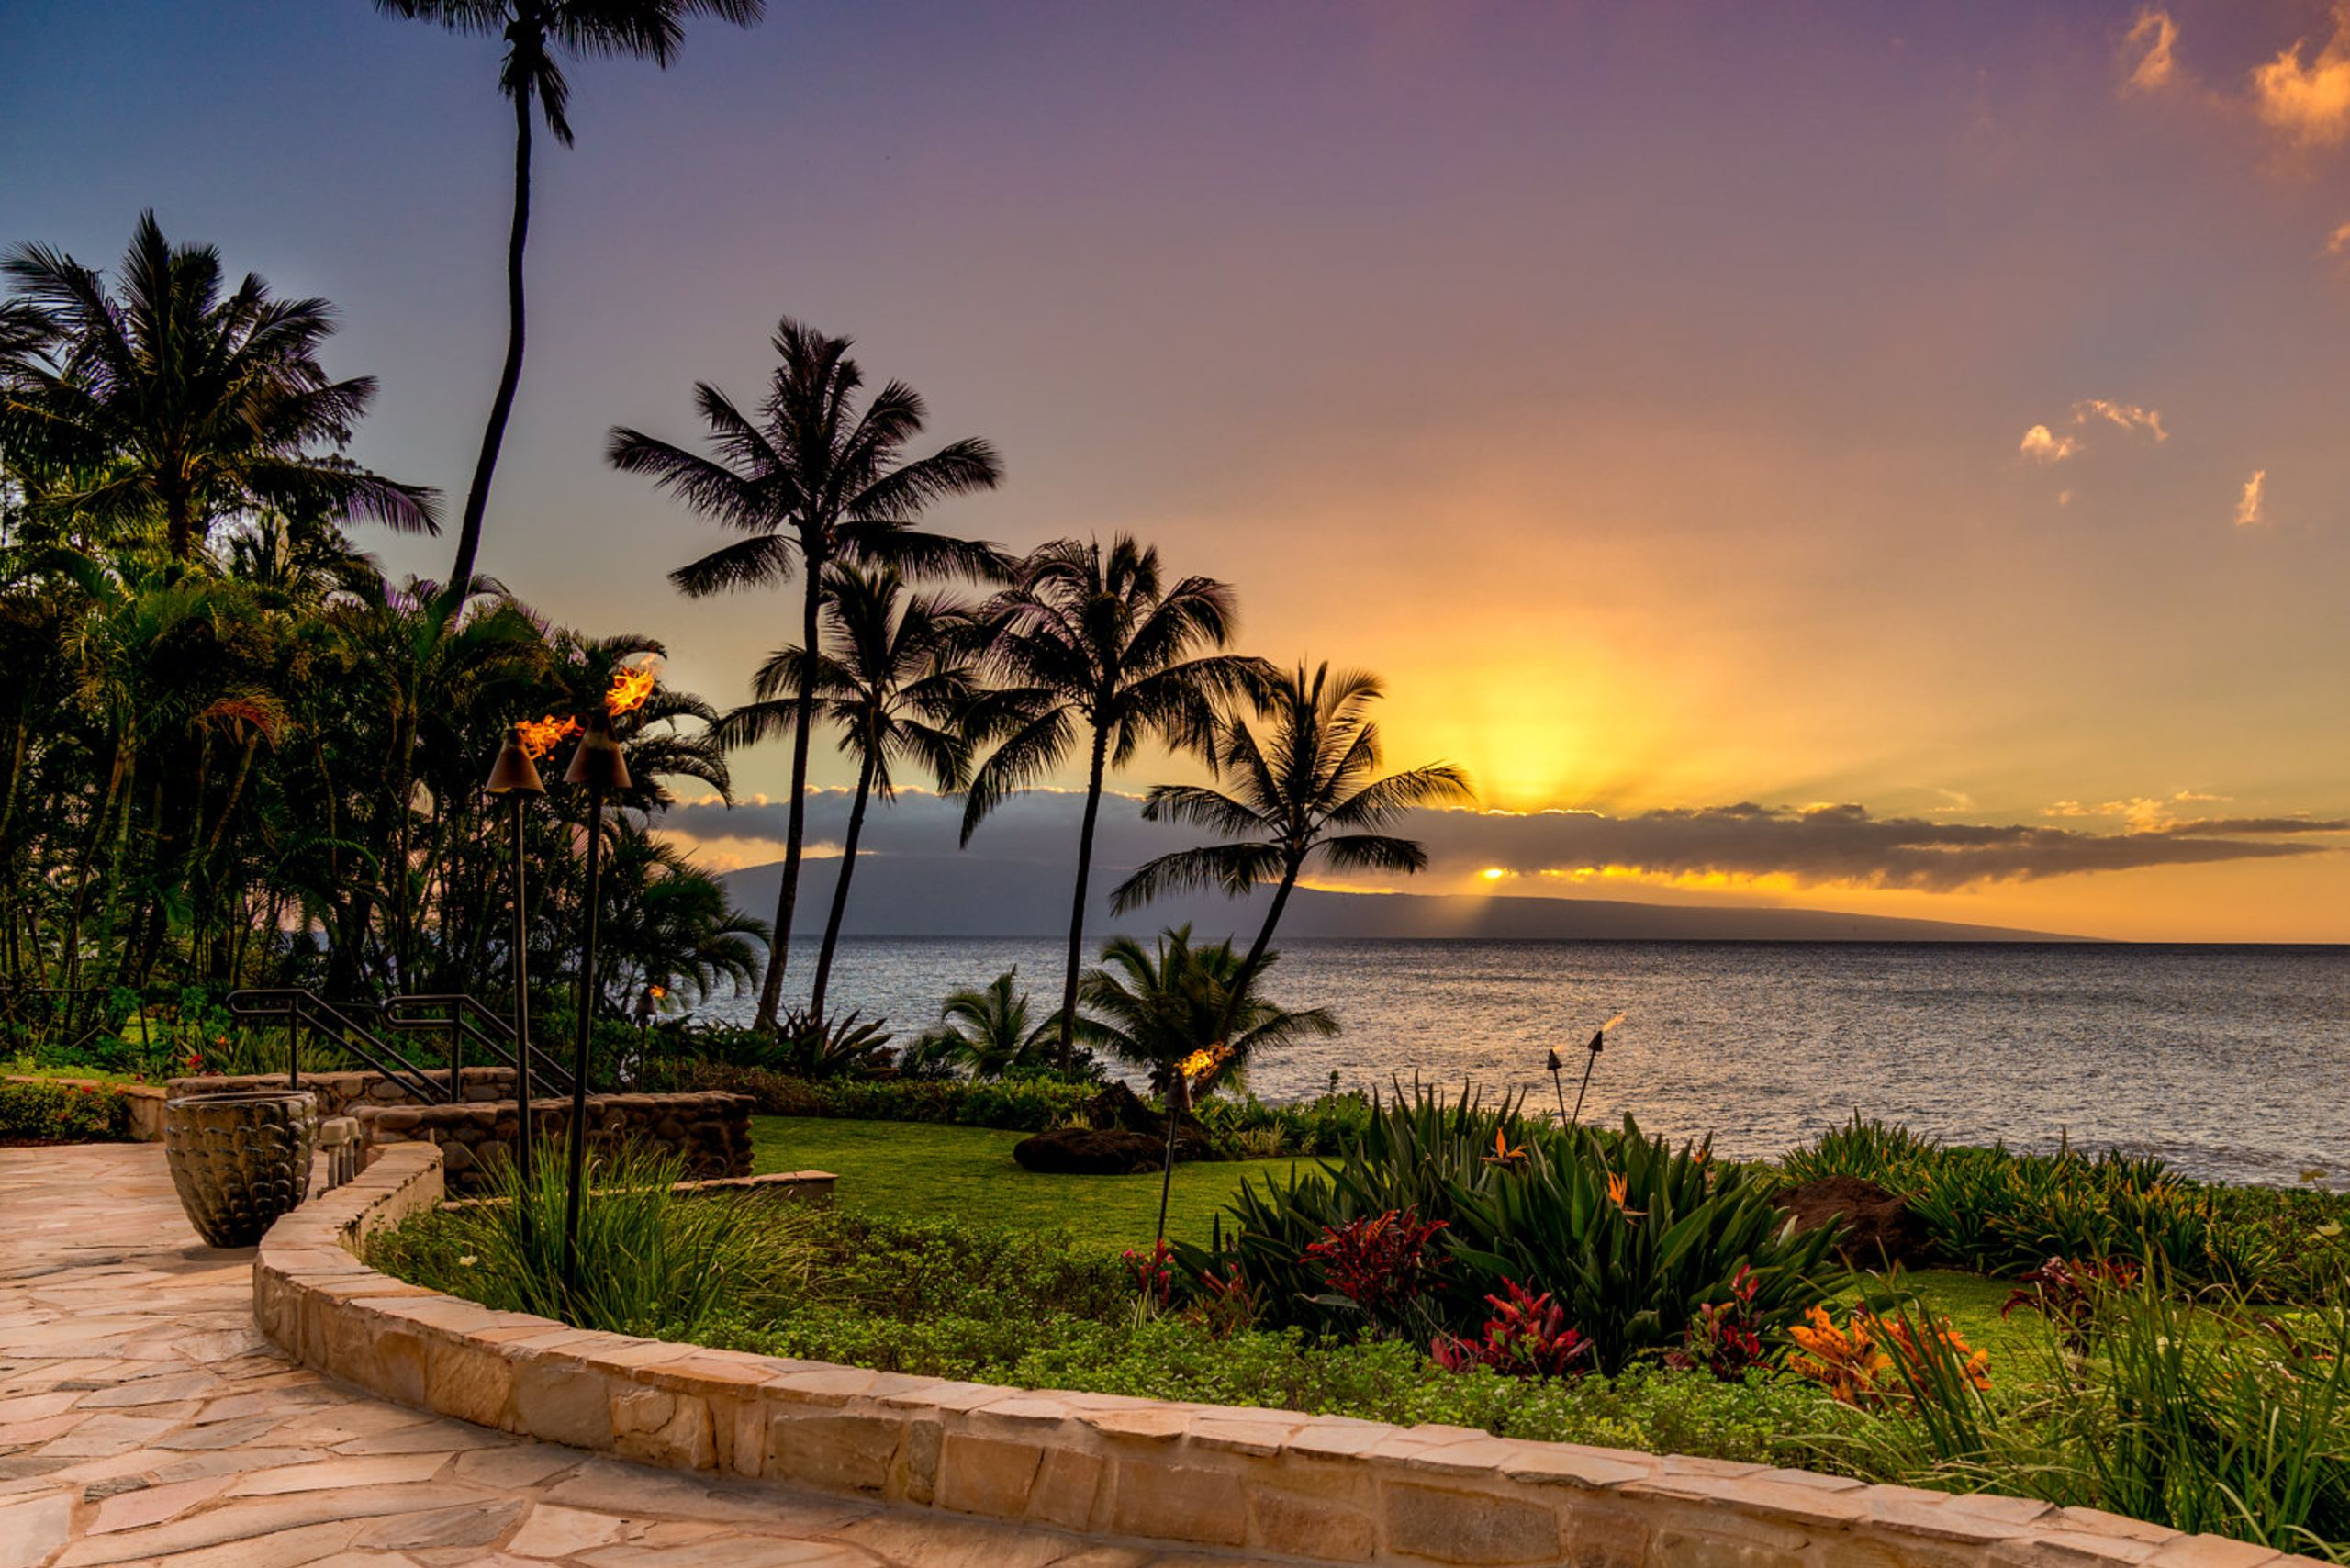 Live the Maui Lifestyle